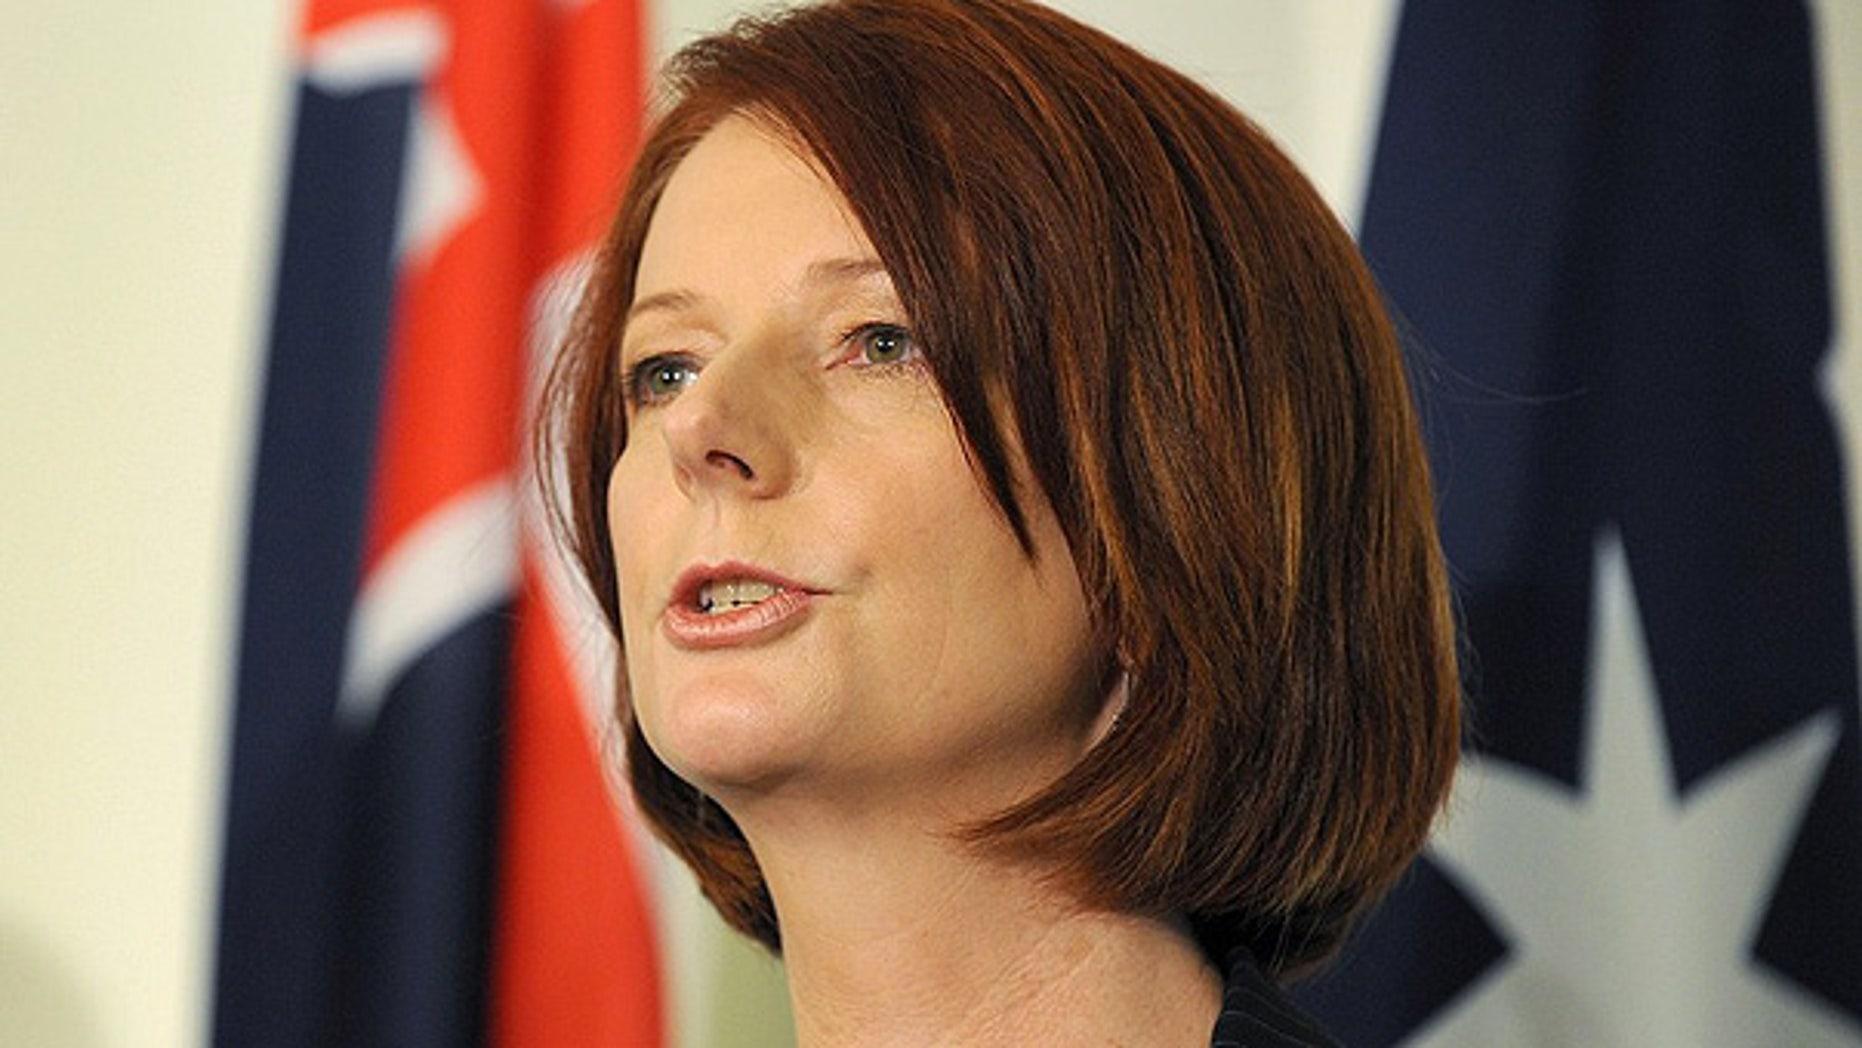 June 24: Australia's new prime minister Julia Gillard speaks during a press conference, in Canberra.